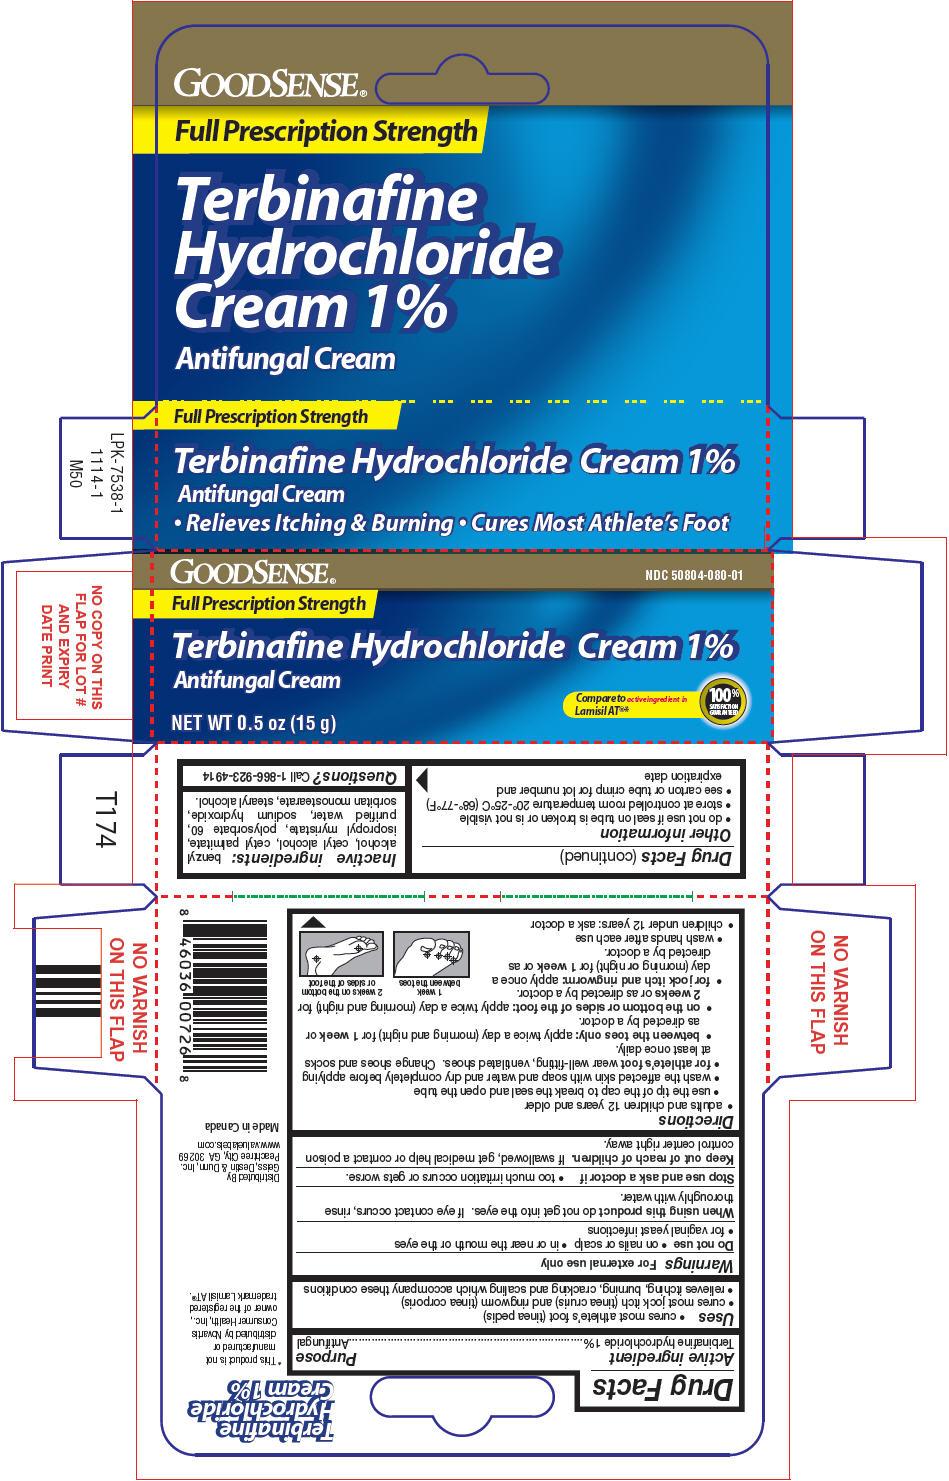 Goodsense Terbinafine Hydrochloride (Terbinafine Hydrochloride) Cream [Geiss, Destin & Dunn, Inc.]